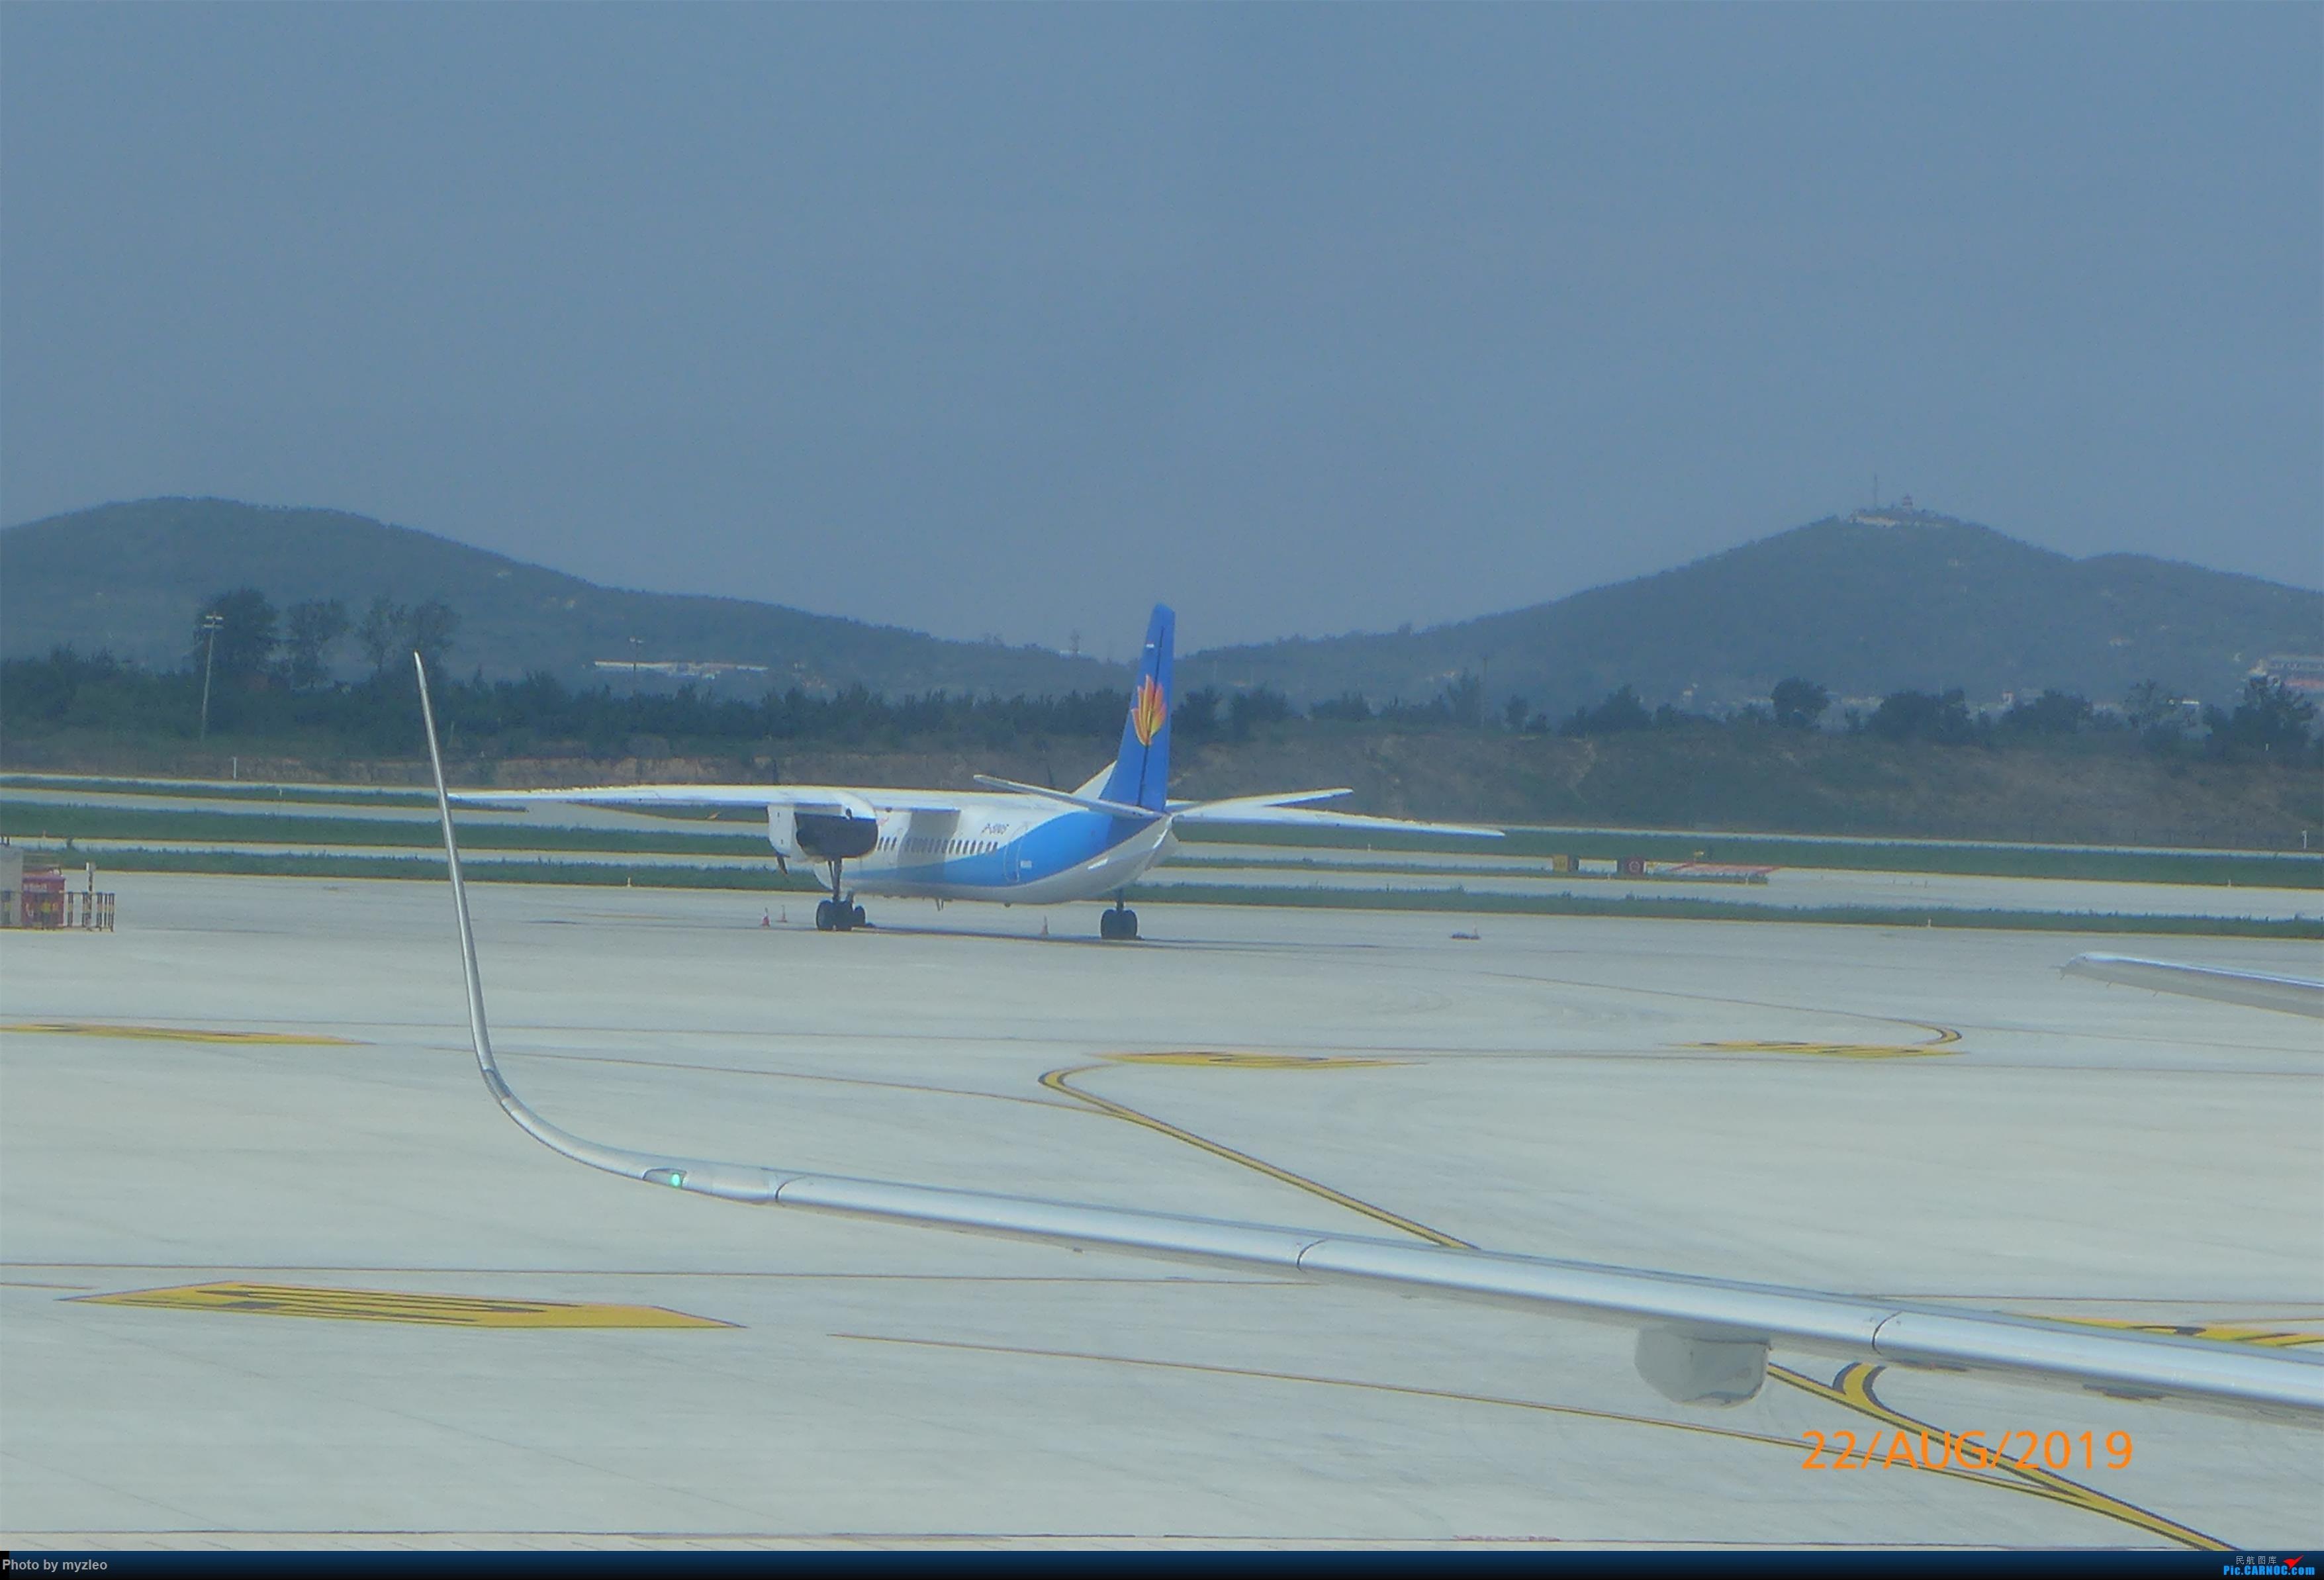 Re:[原创]【myzleo的游记5.2】梦圆一九(2)首访南苑把梦圆,初搭巴航连新缘 XIAN AIRCRAFT MA 60 B-3705 中国烟台蓬莱国际机场